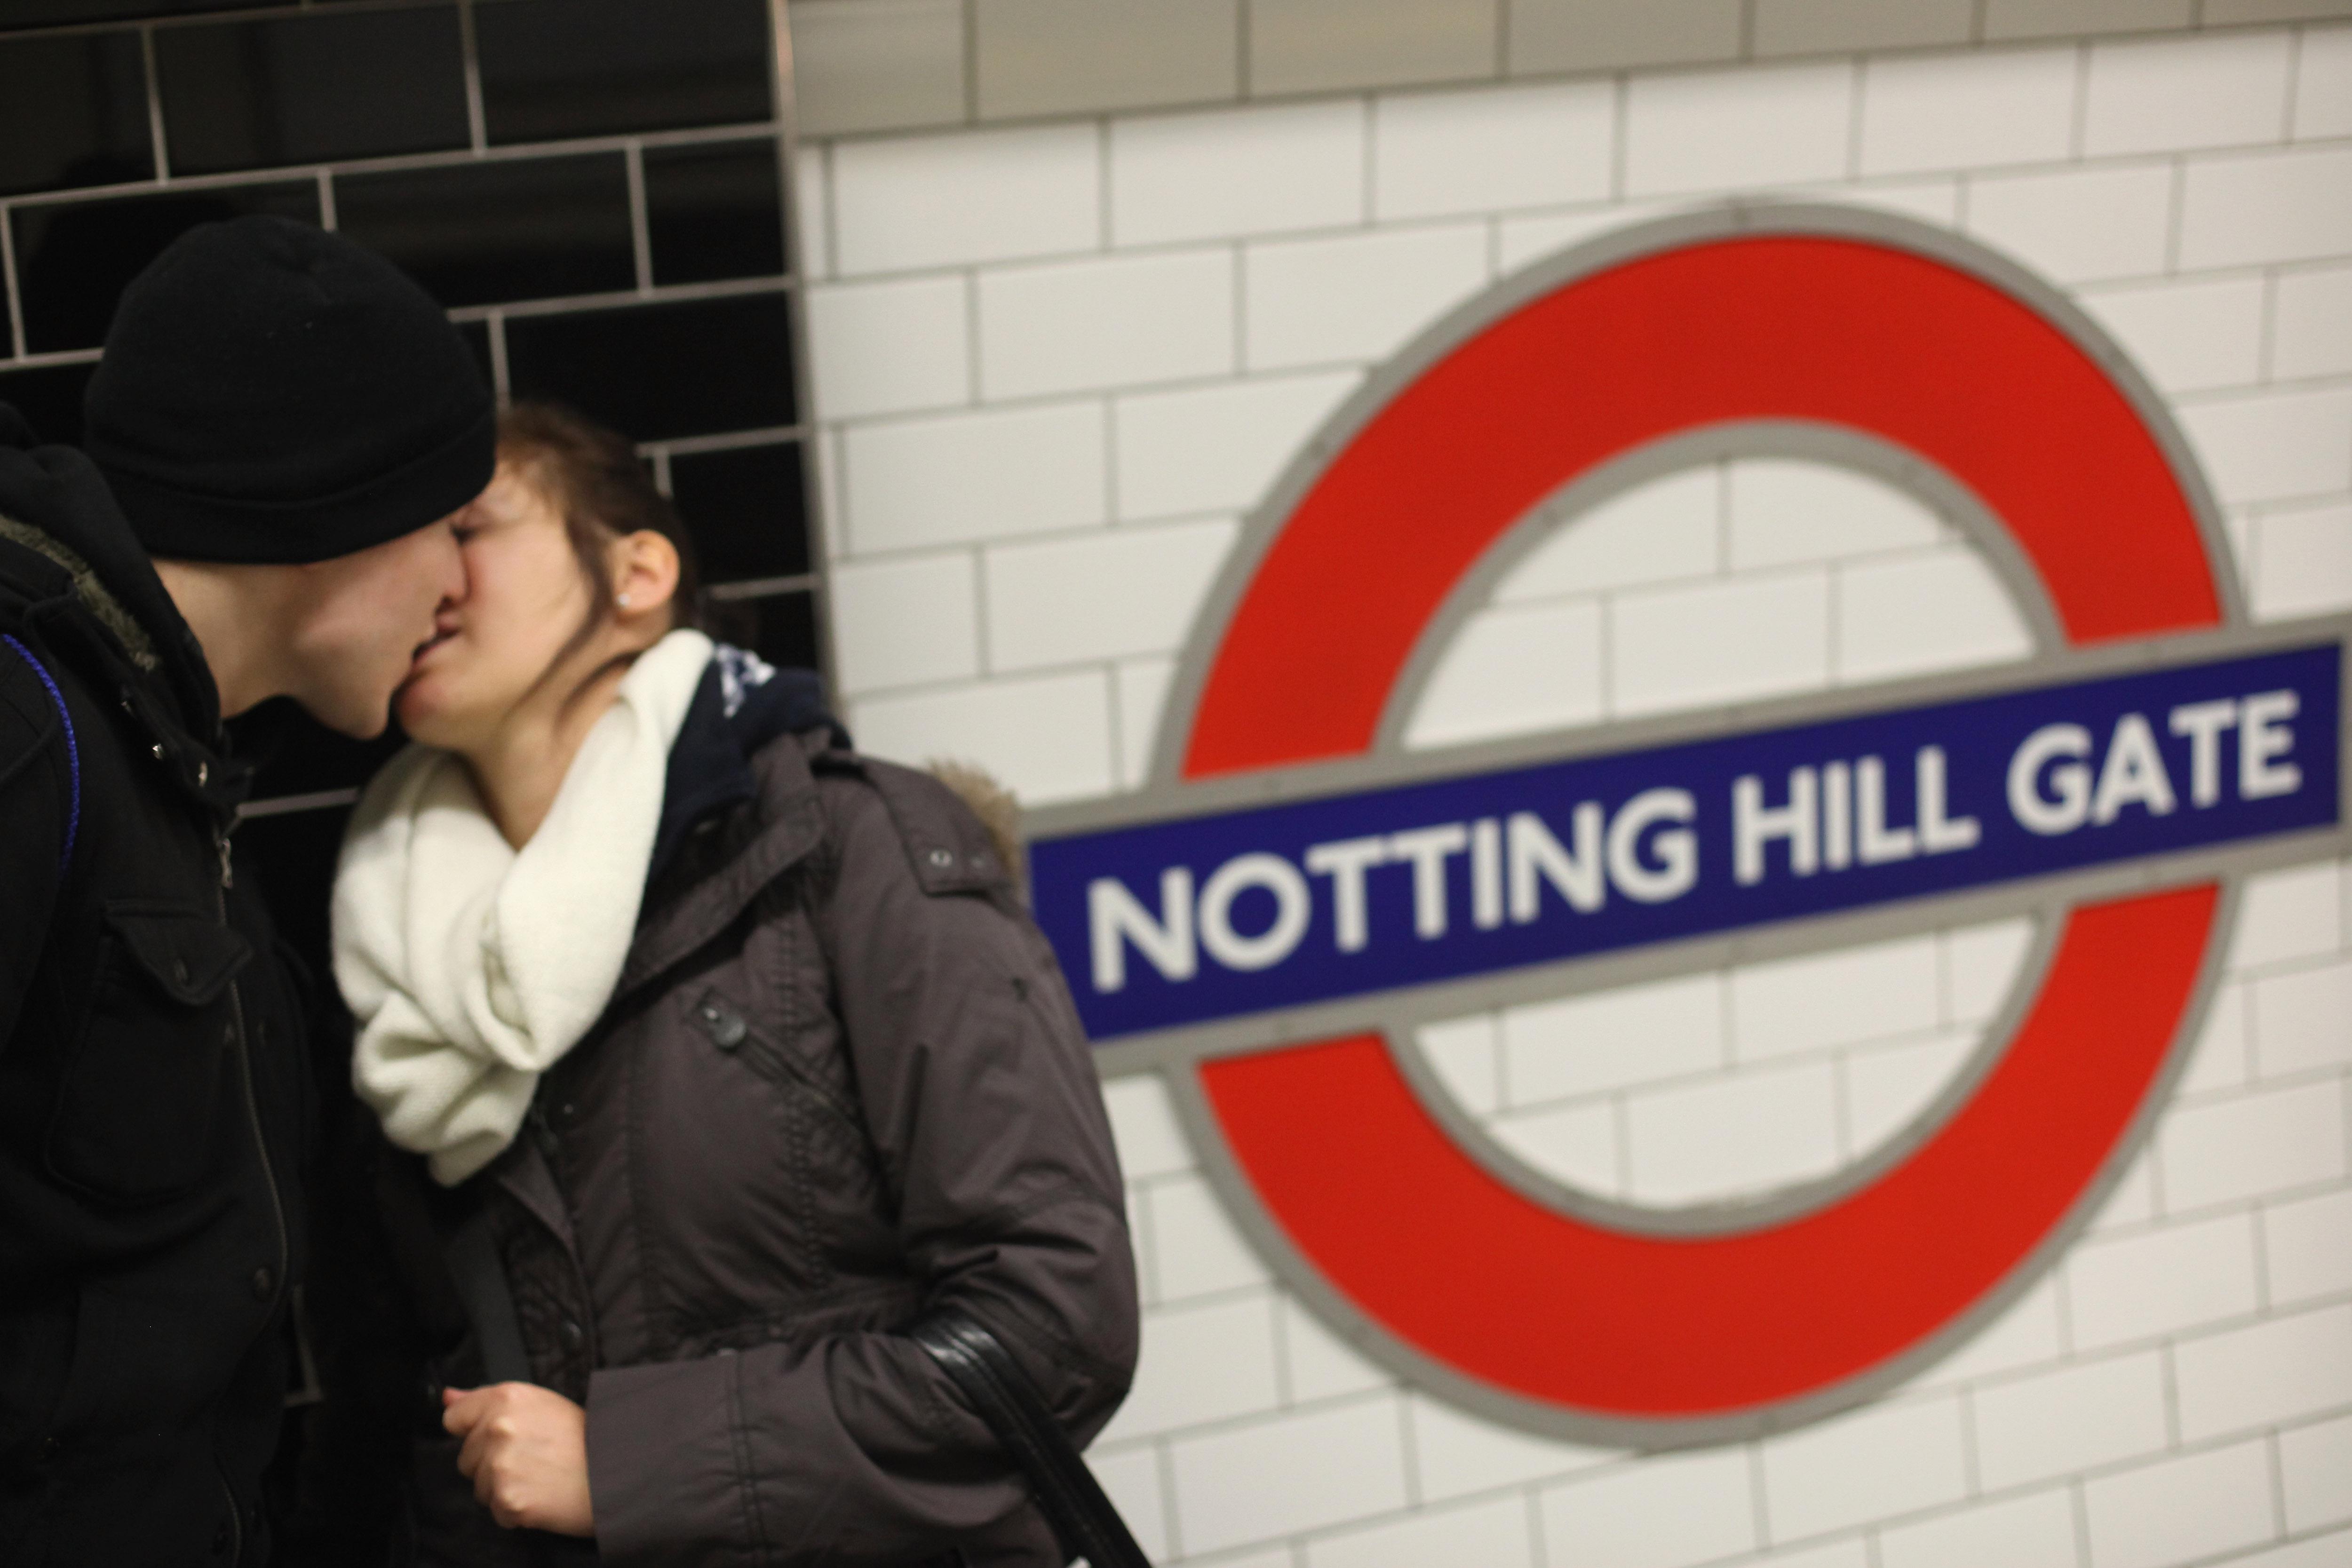 London 2012 - London Transport